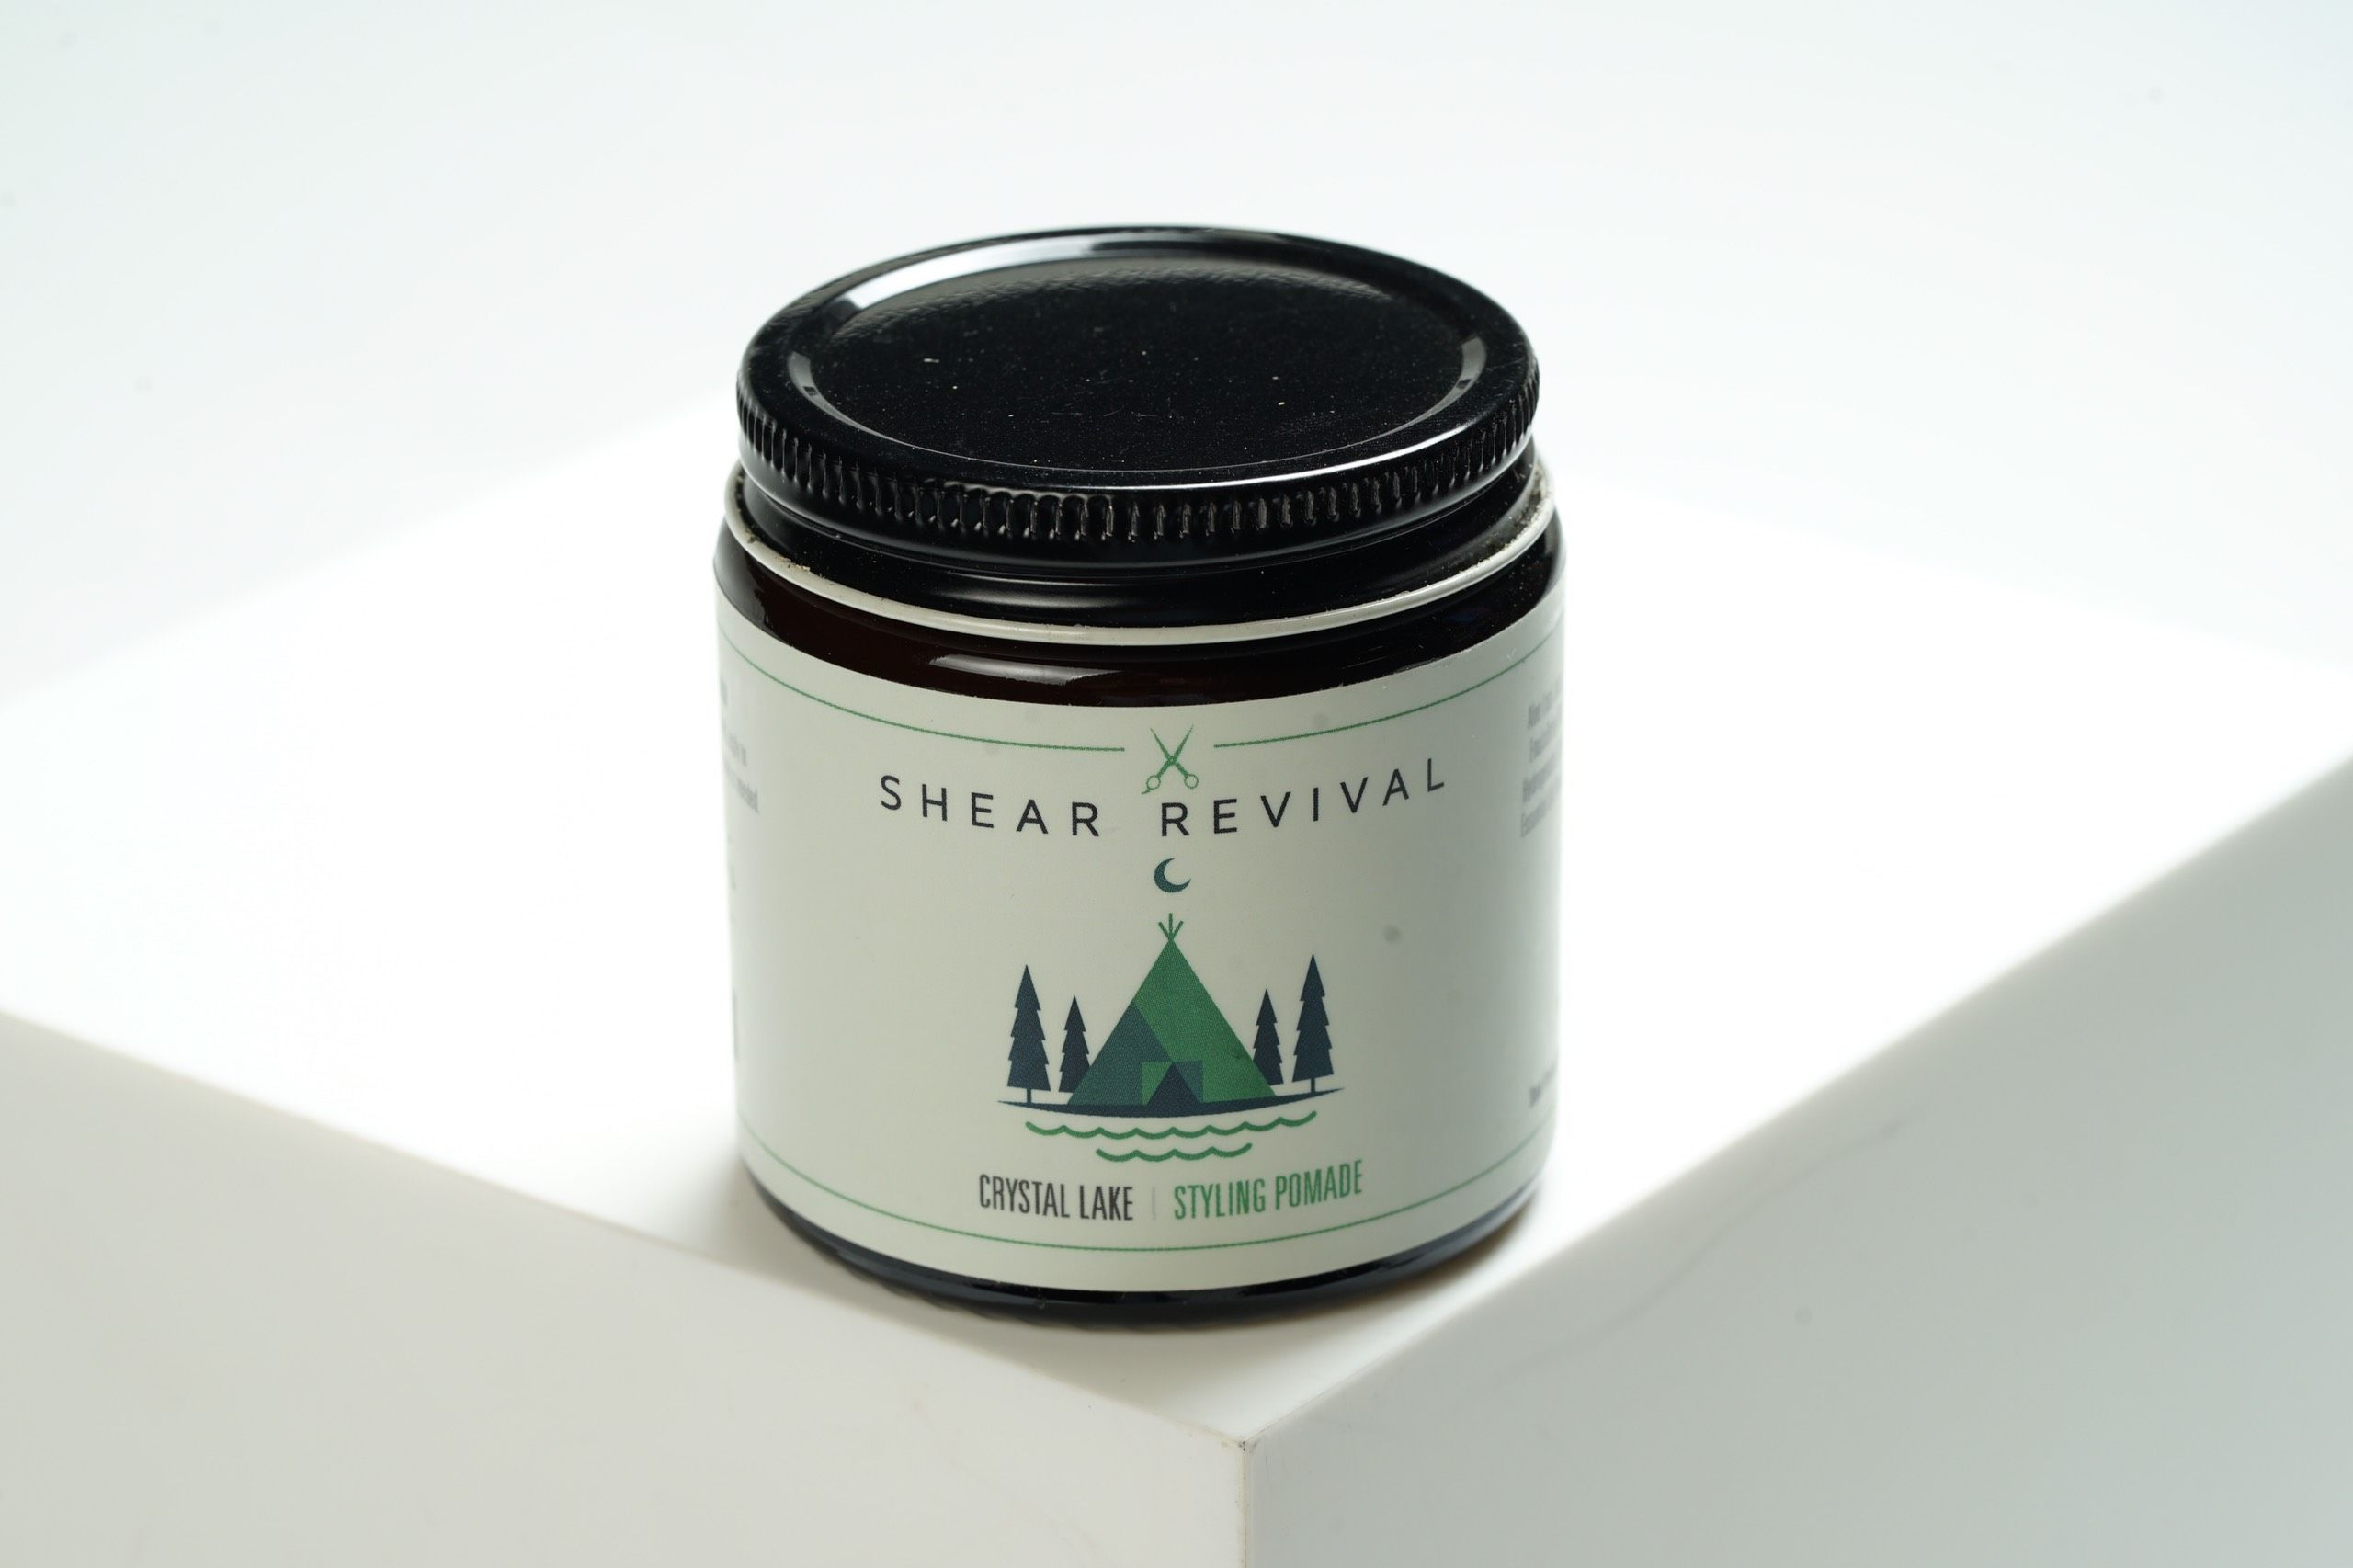 Shervival Crystal Lake Styling Pomade